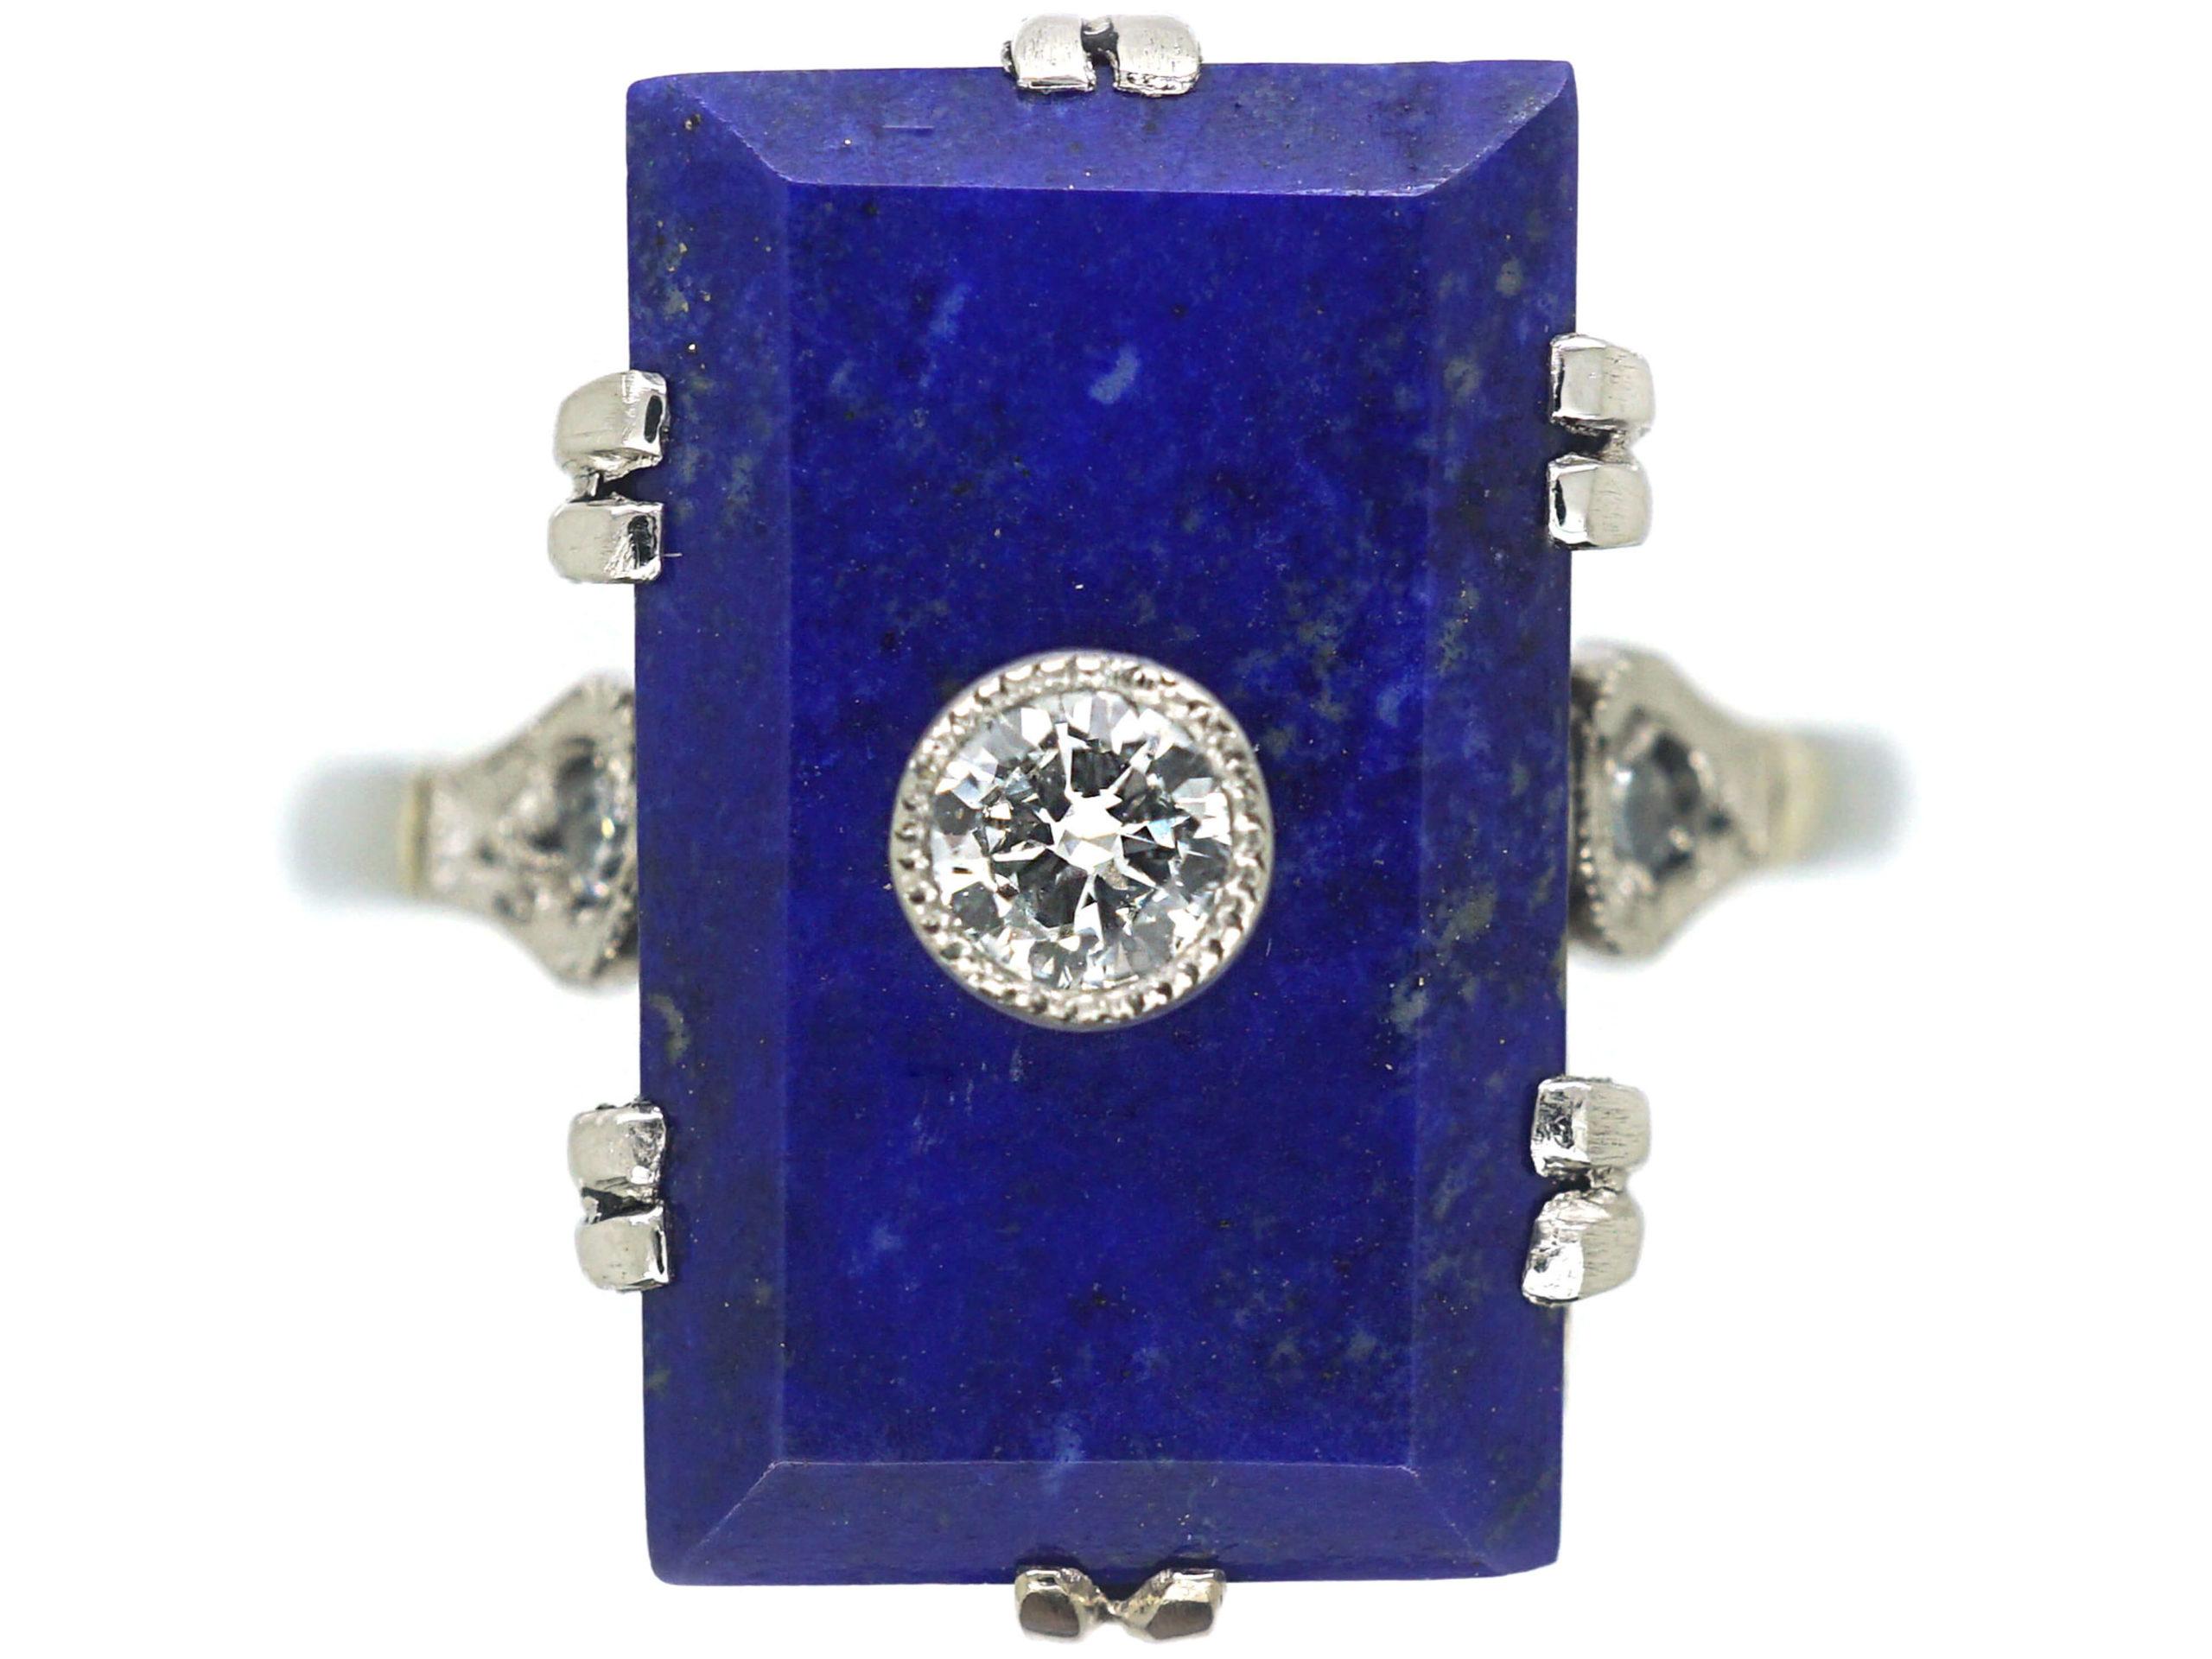 Art Deco 18ct White Gold & Platinum, Lapis Lazuli & Diamond Rectangular Shaped Ring